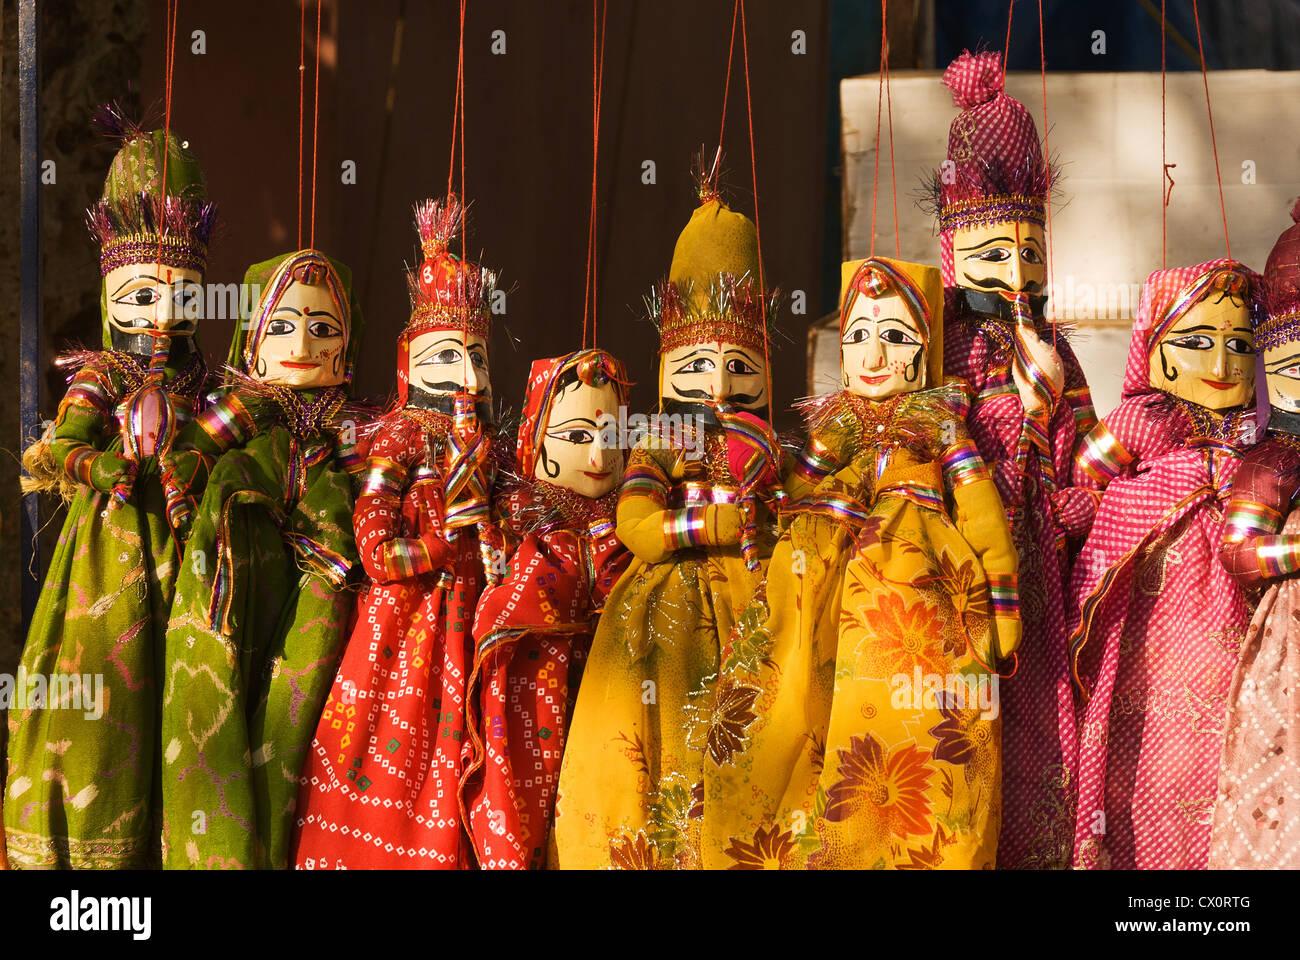 Elk201-3498 India, Kerala, Kochi, Jew Town, handicraft store, puppets - Stock Image